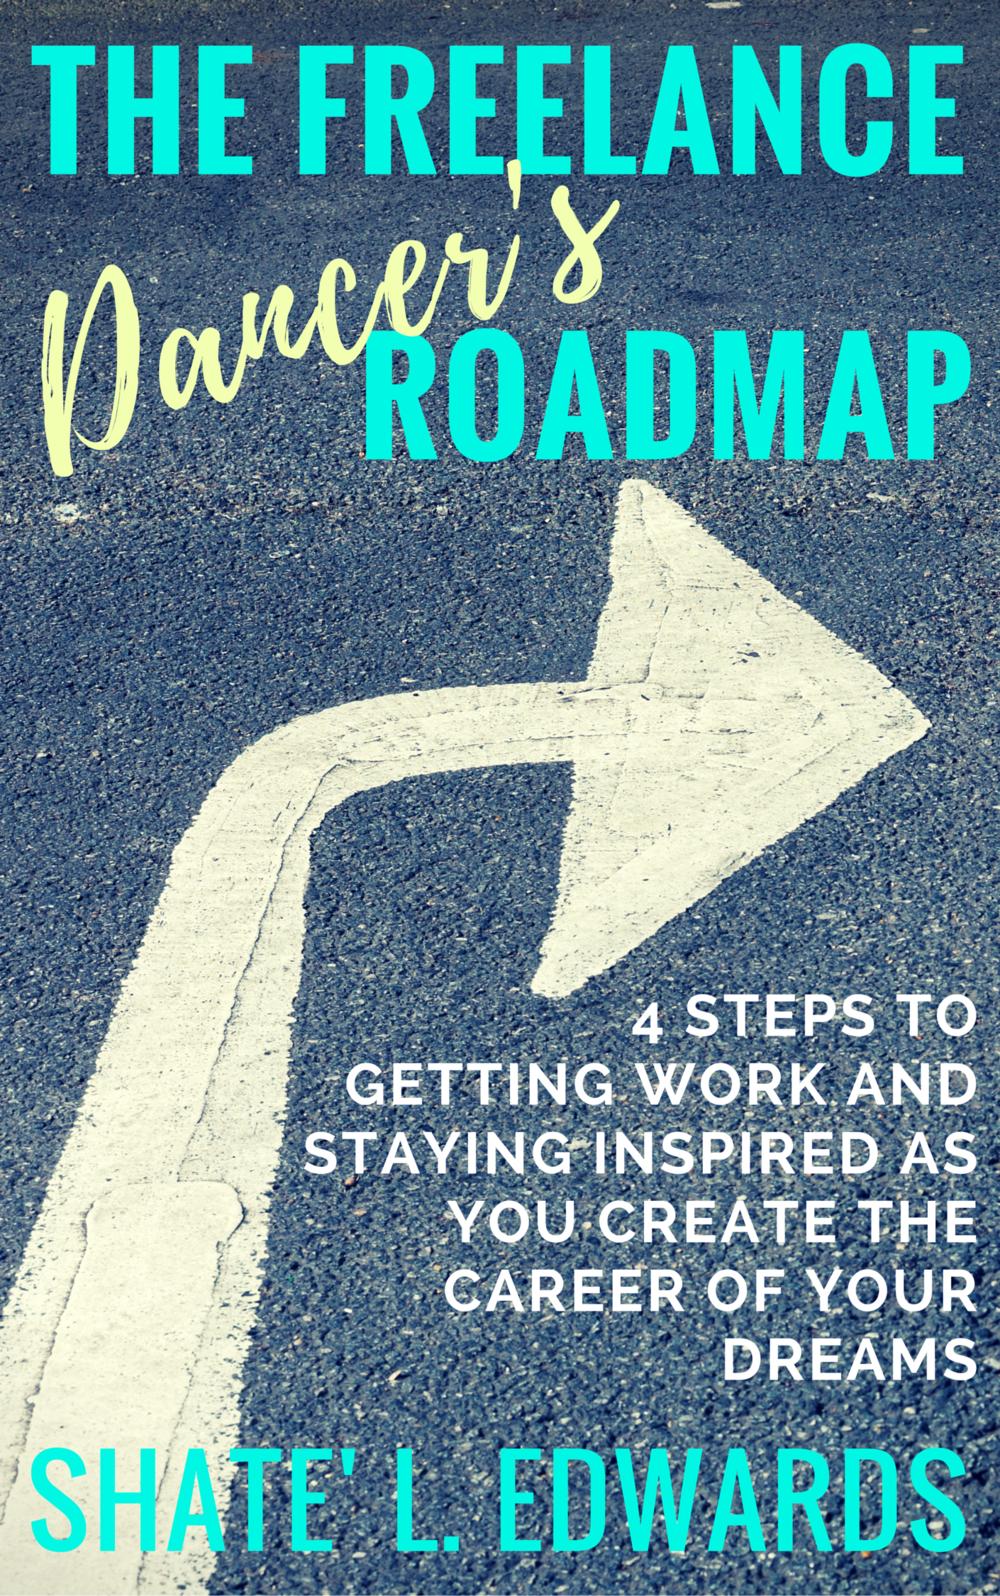 The Freelance Dancer's Roadmap - The Working Dancer